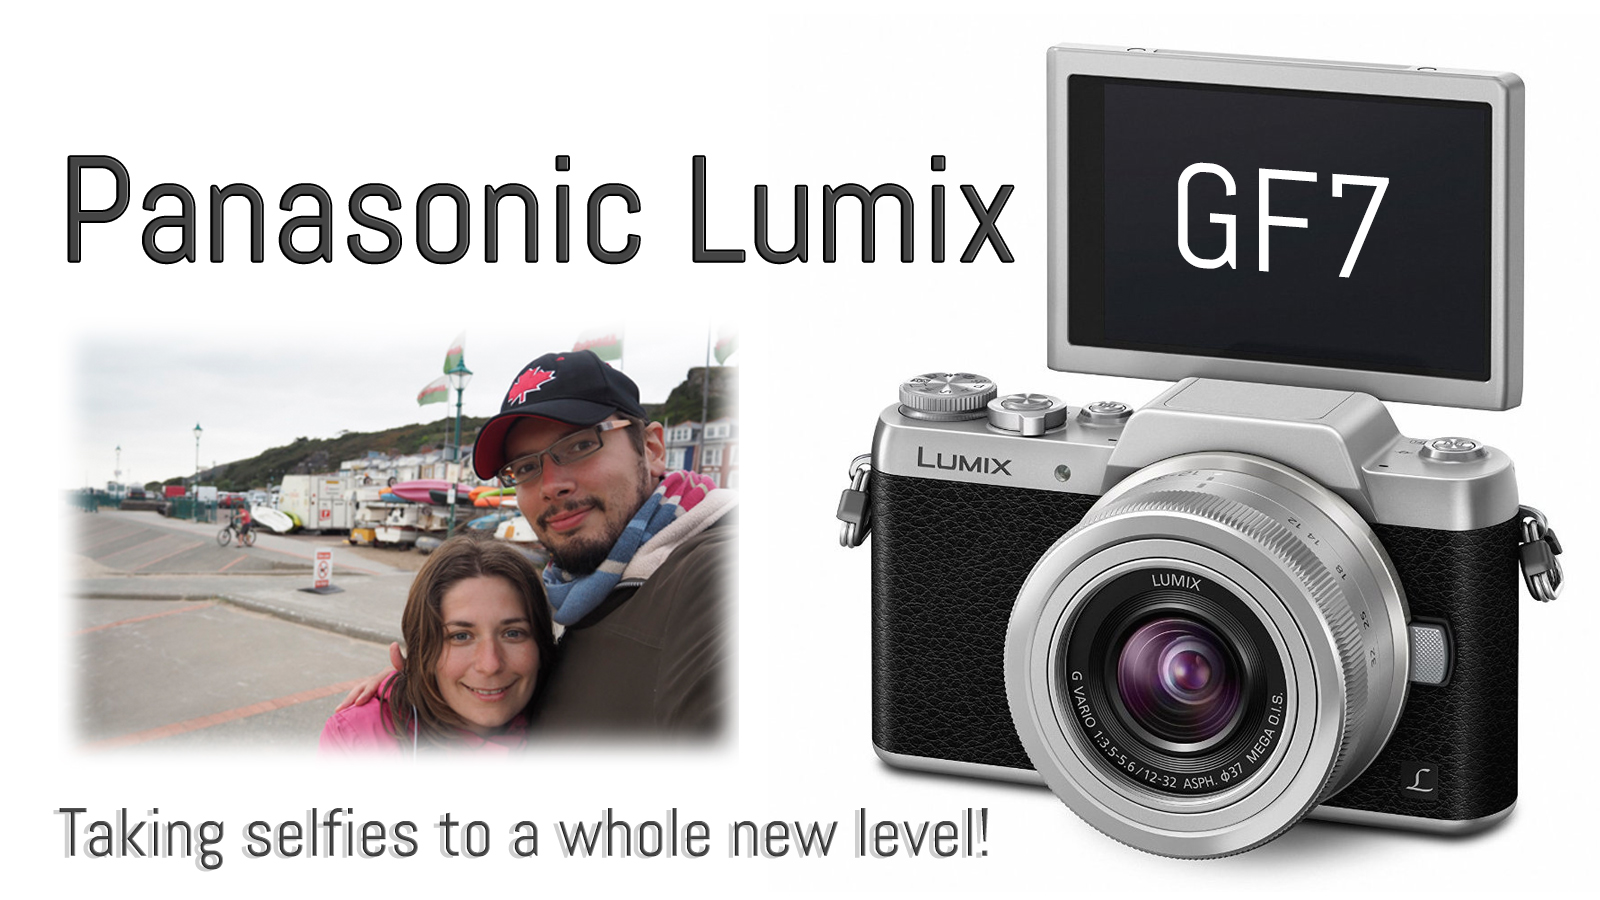 panasonic-lumix-gf7-selfie